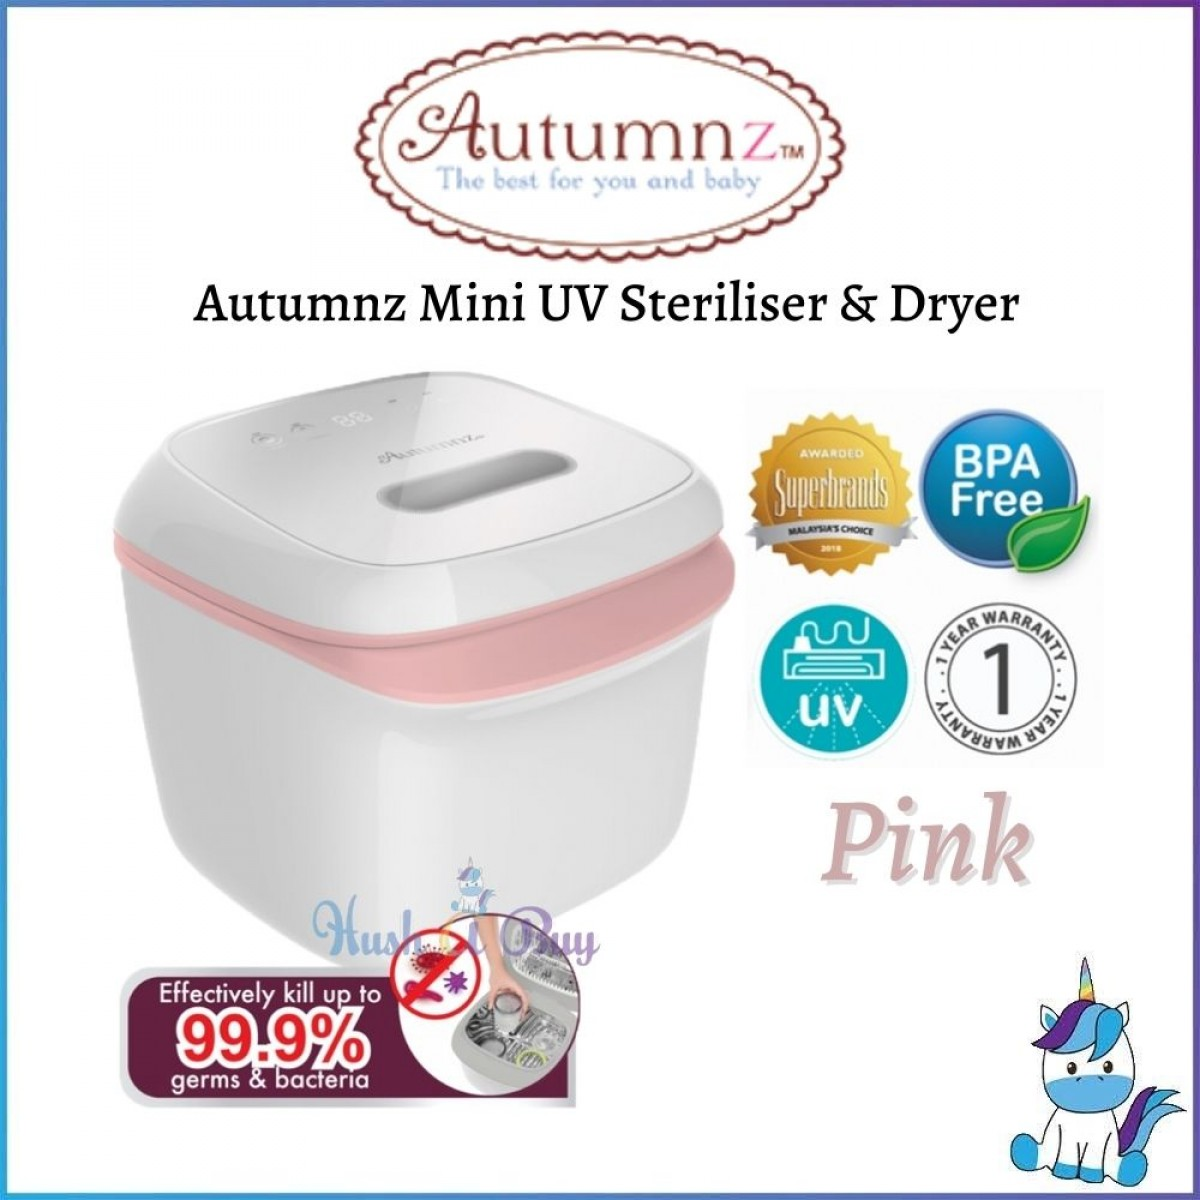 Autumnz Mini UV Steriliser & Dryer - Grey / Pink